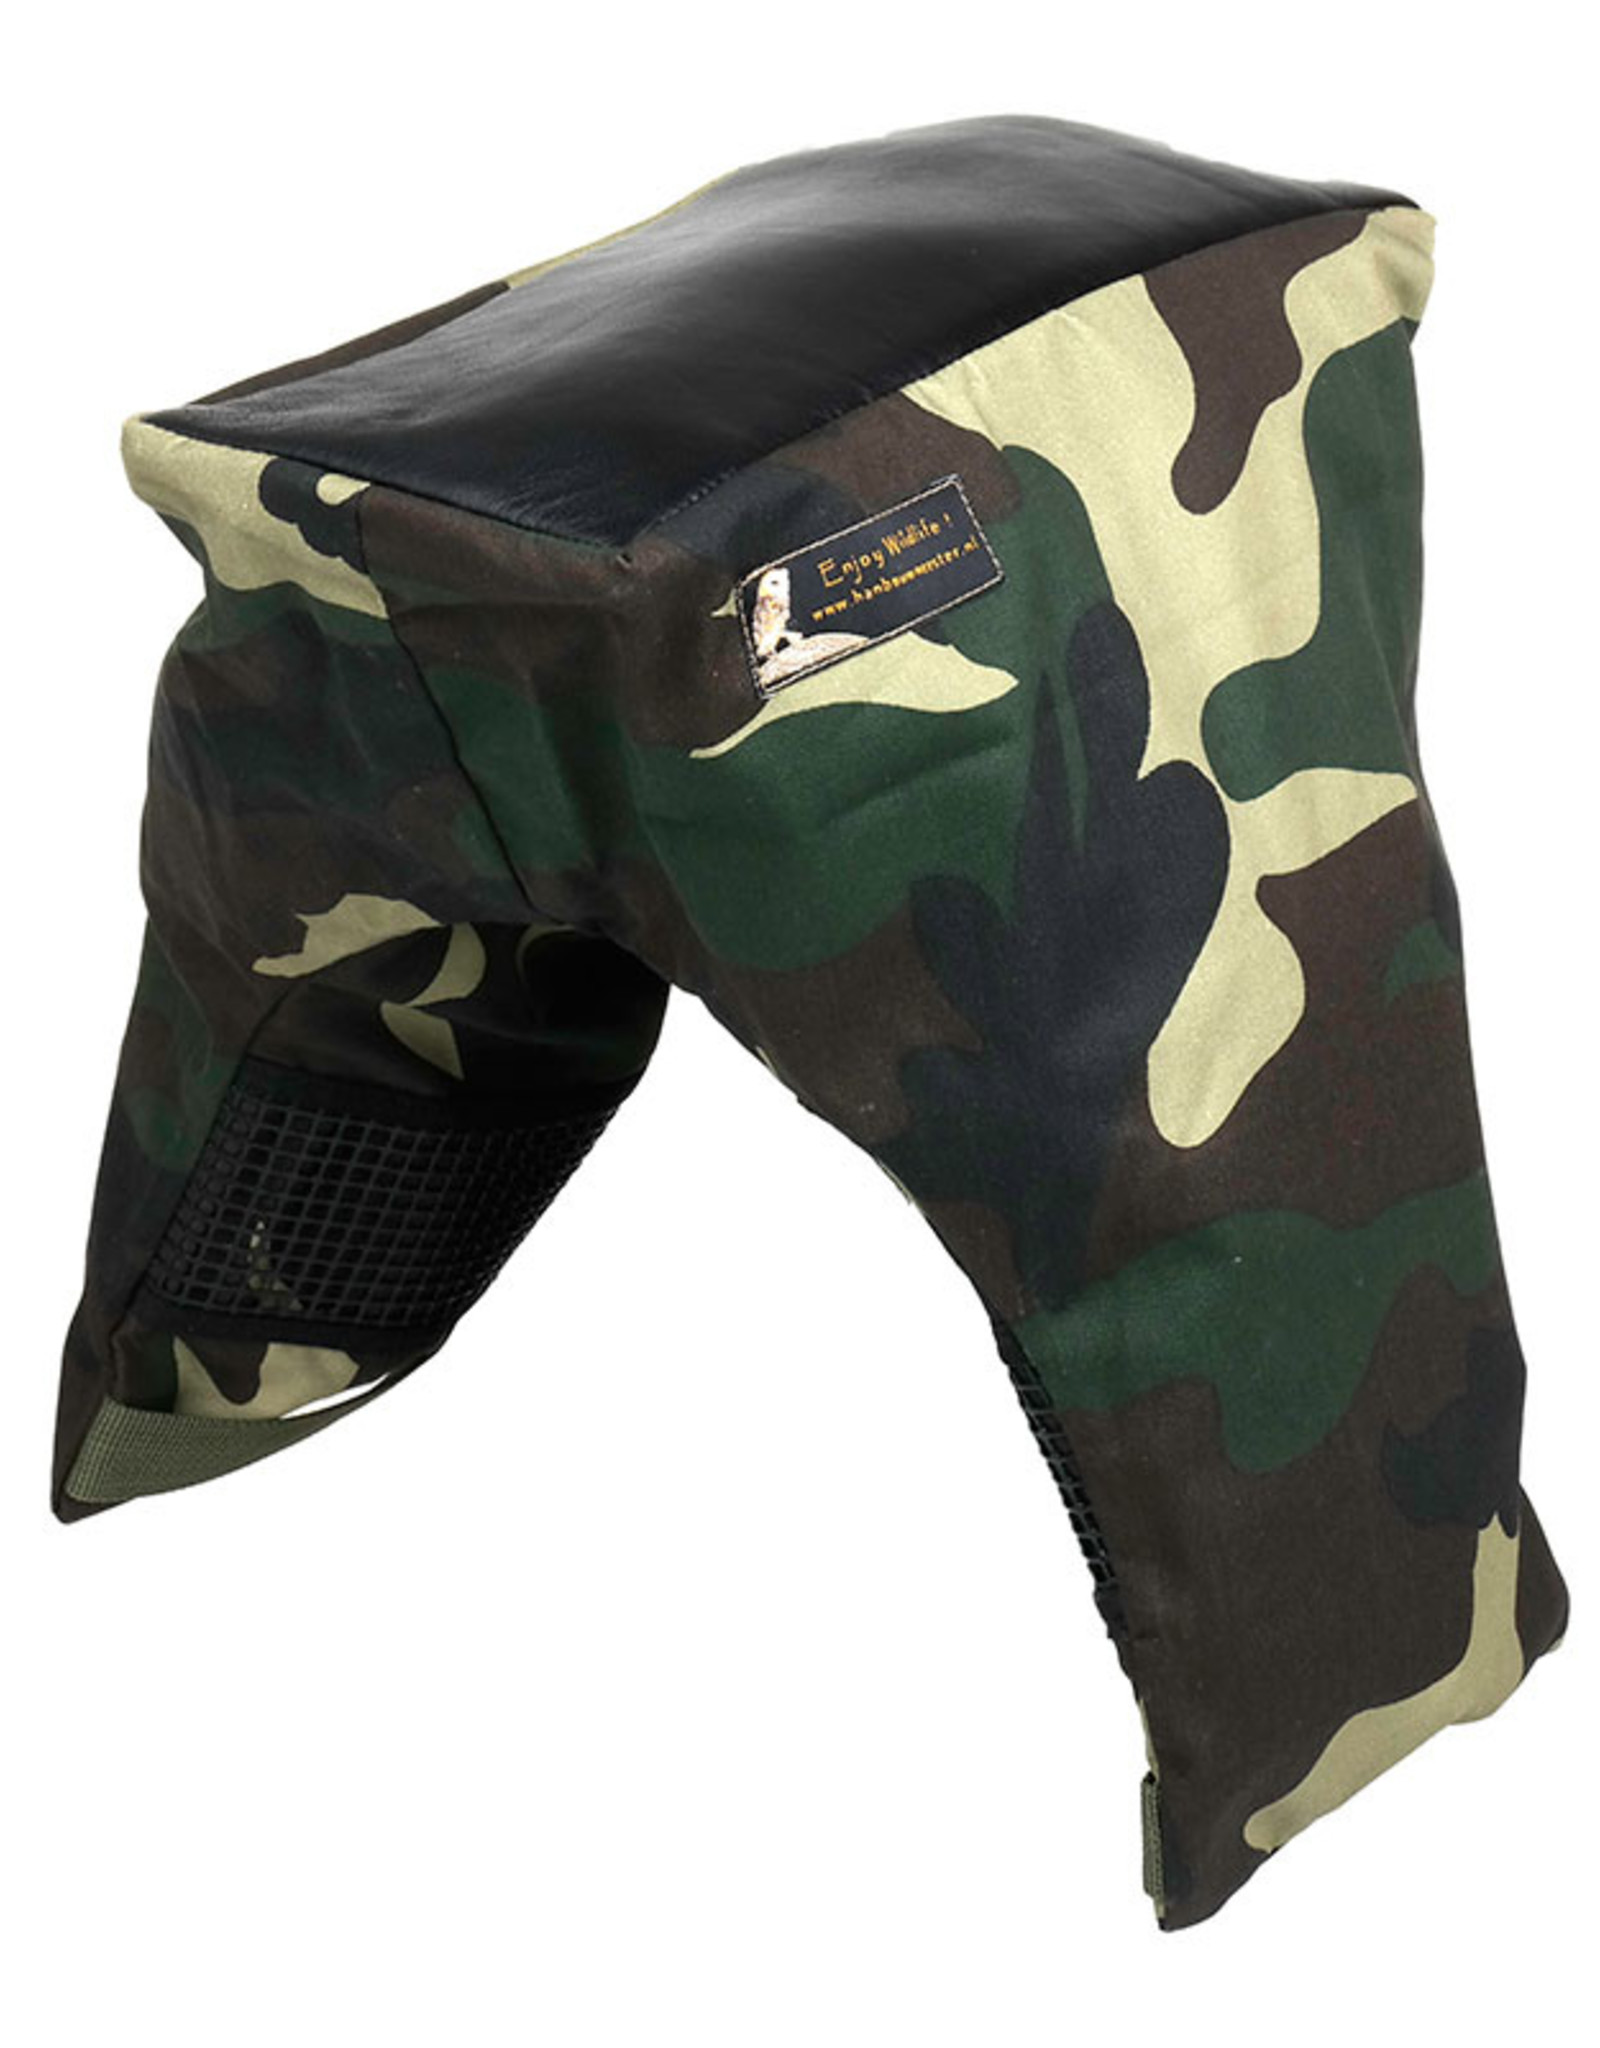 HBN - Enjoy Wildlife! HBN Long trousers beanbag II